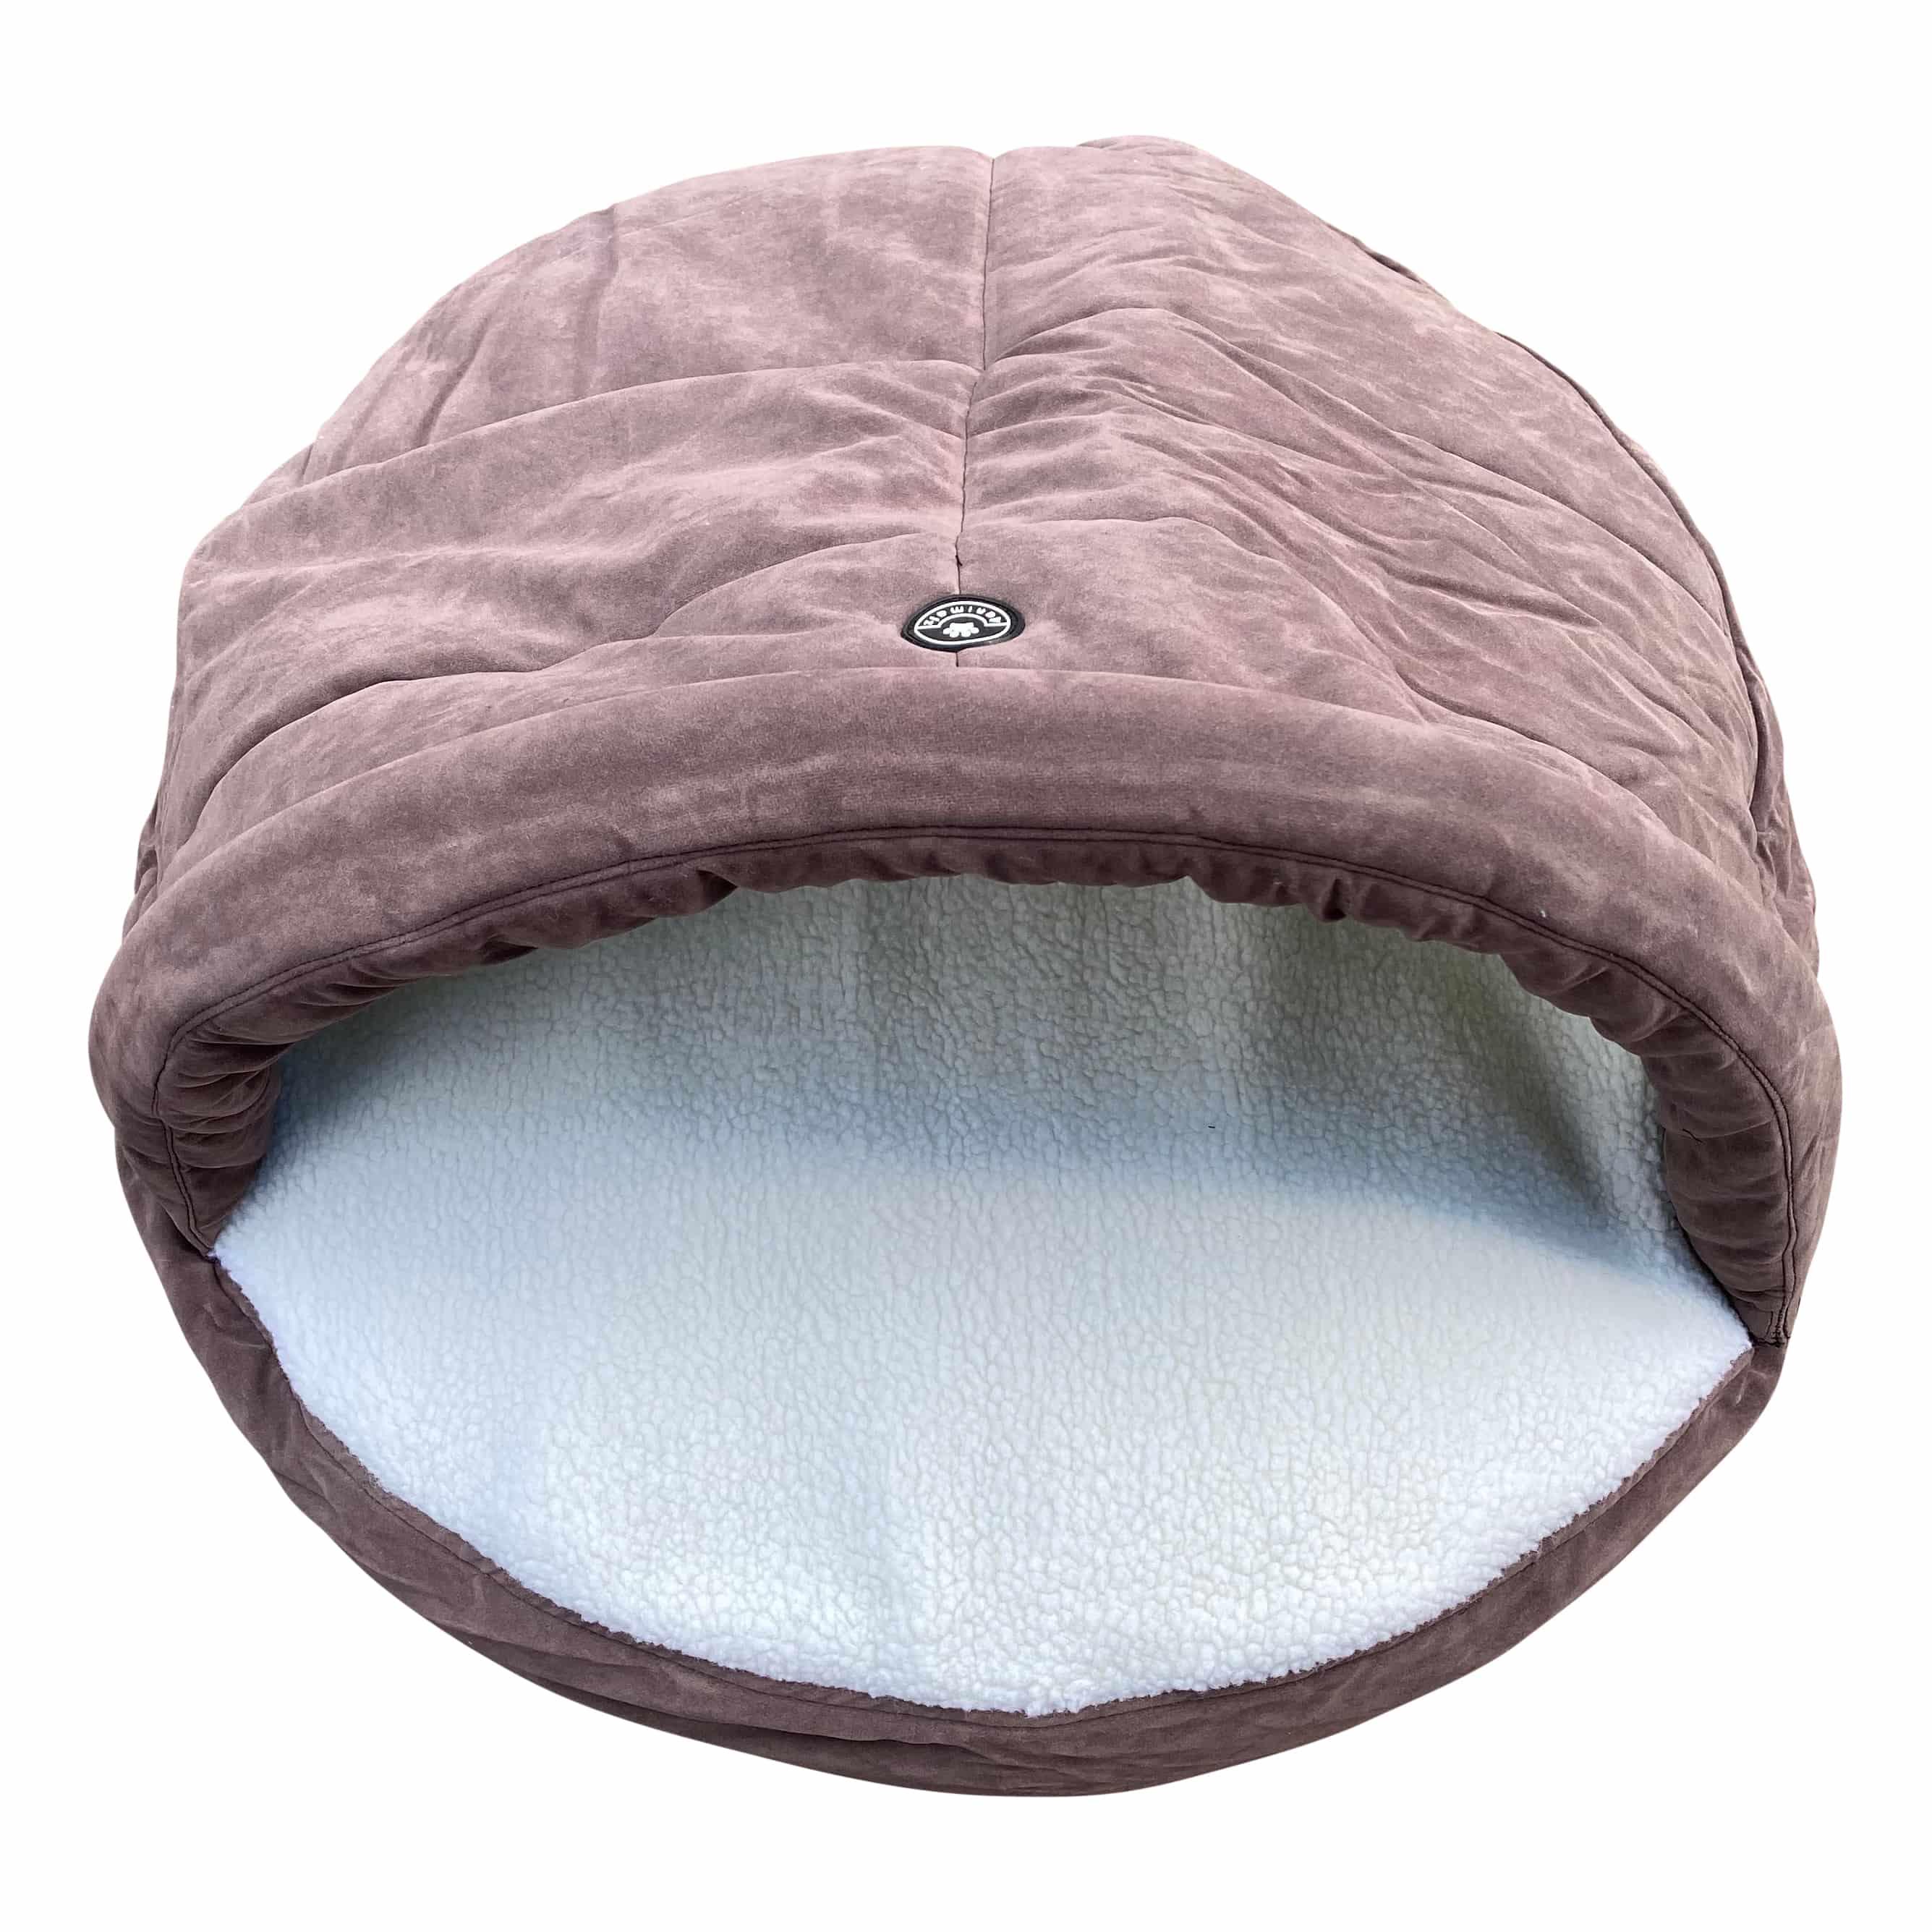 4animalz warme Snuggle Hondenmand M - 64x64x10cm - Taupe